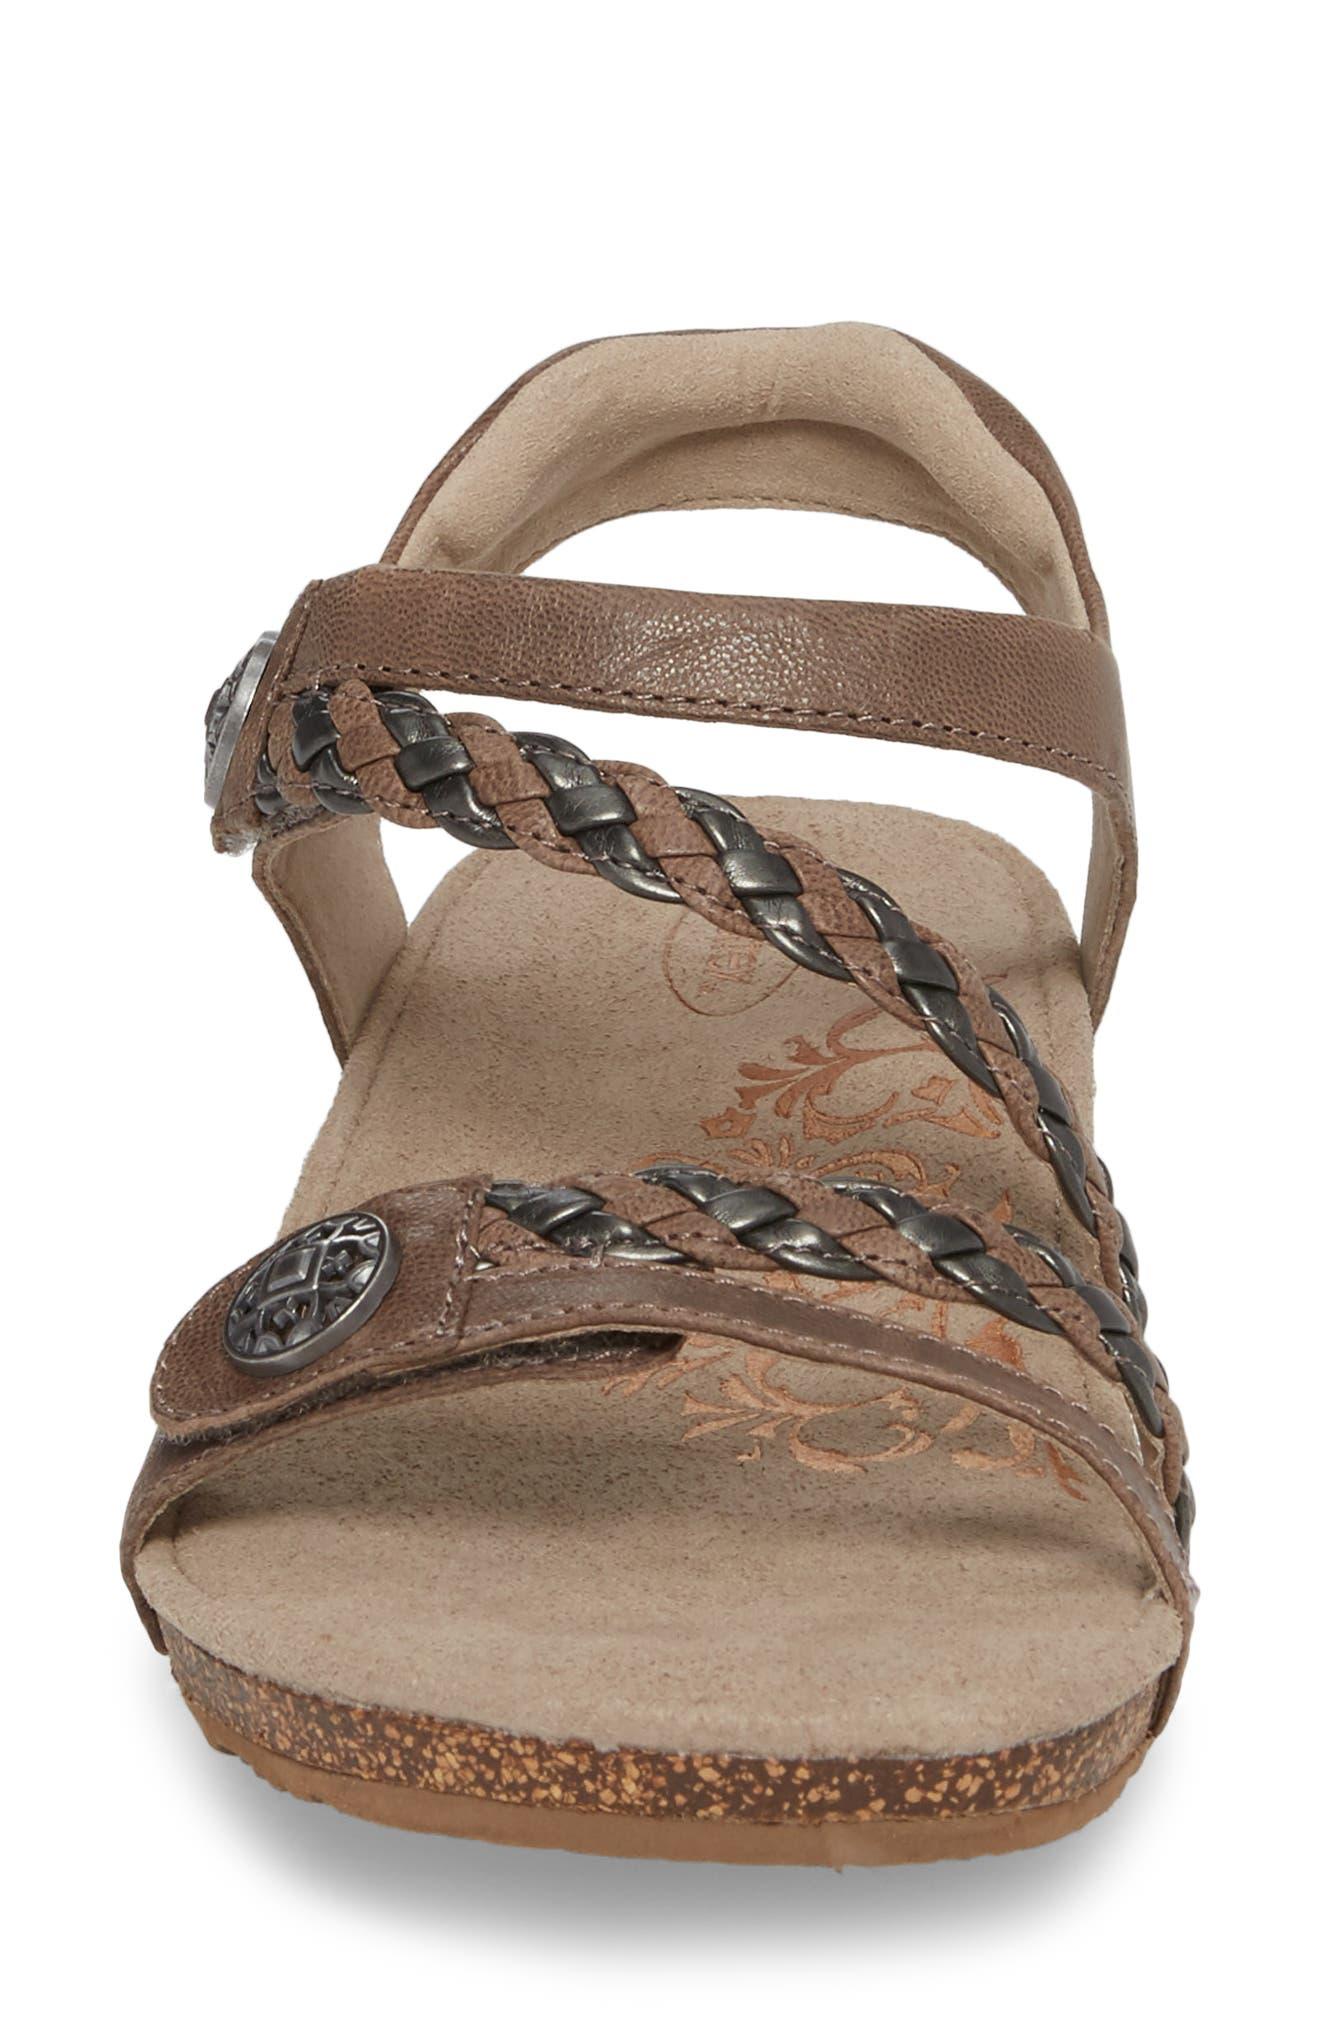 'Jillian' Braided Leather Strap Sandal,                             Alternate thumbnail 4, color,                             GREY LEATHER